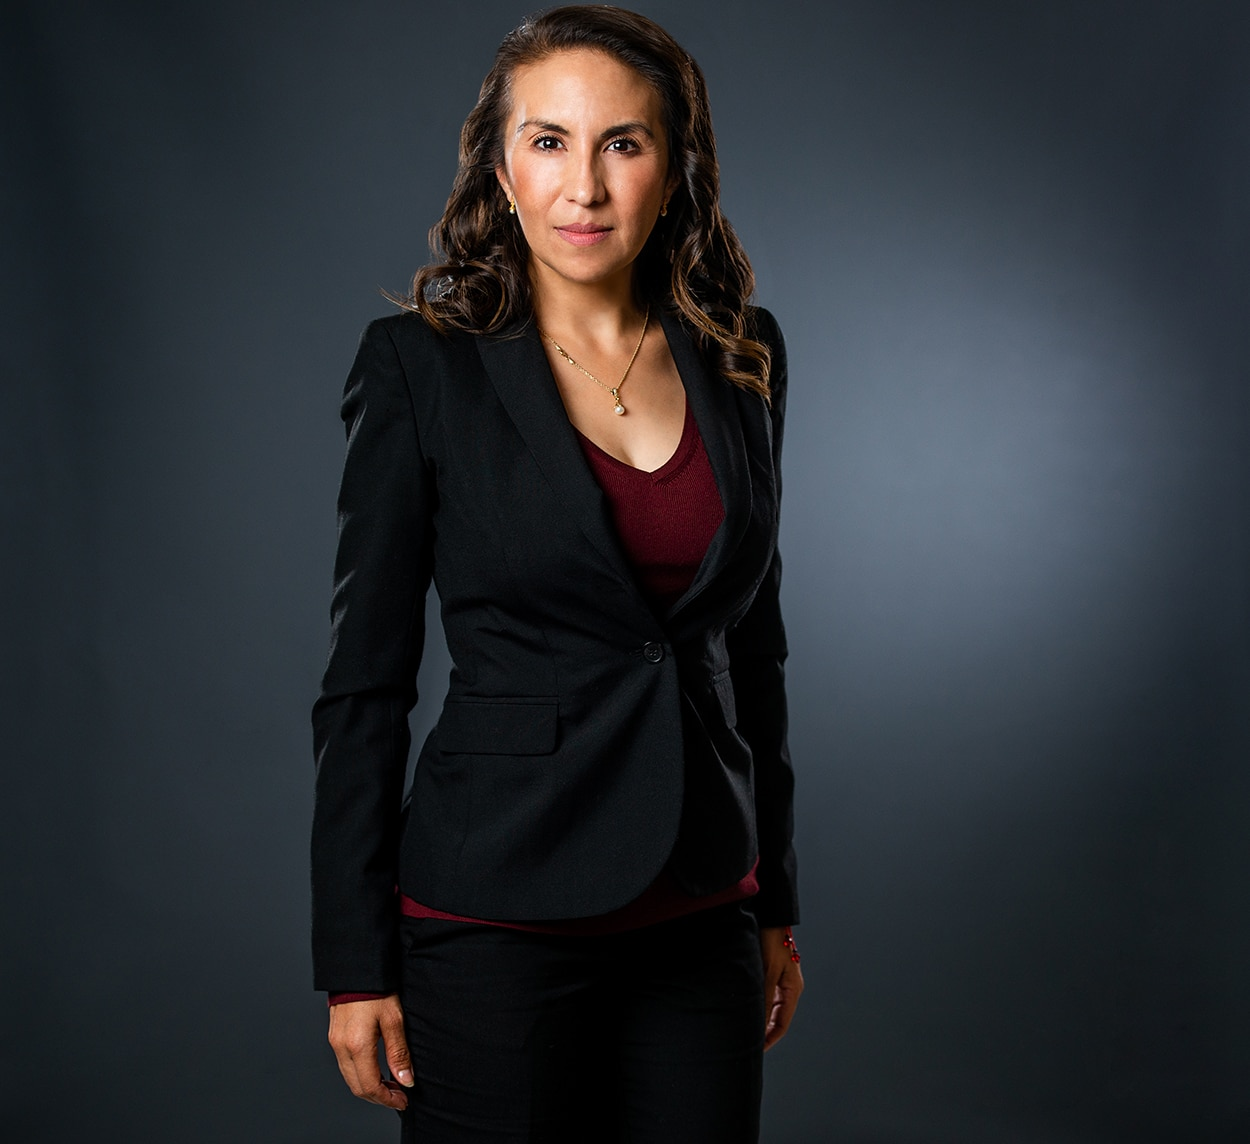 ROSALINDA FARIAS  Your Financial Professional & Insurance Agent